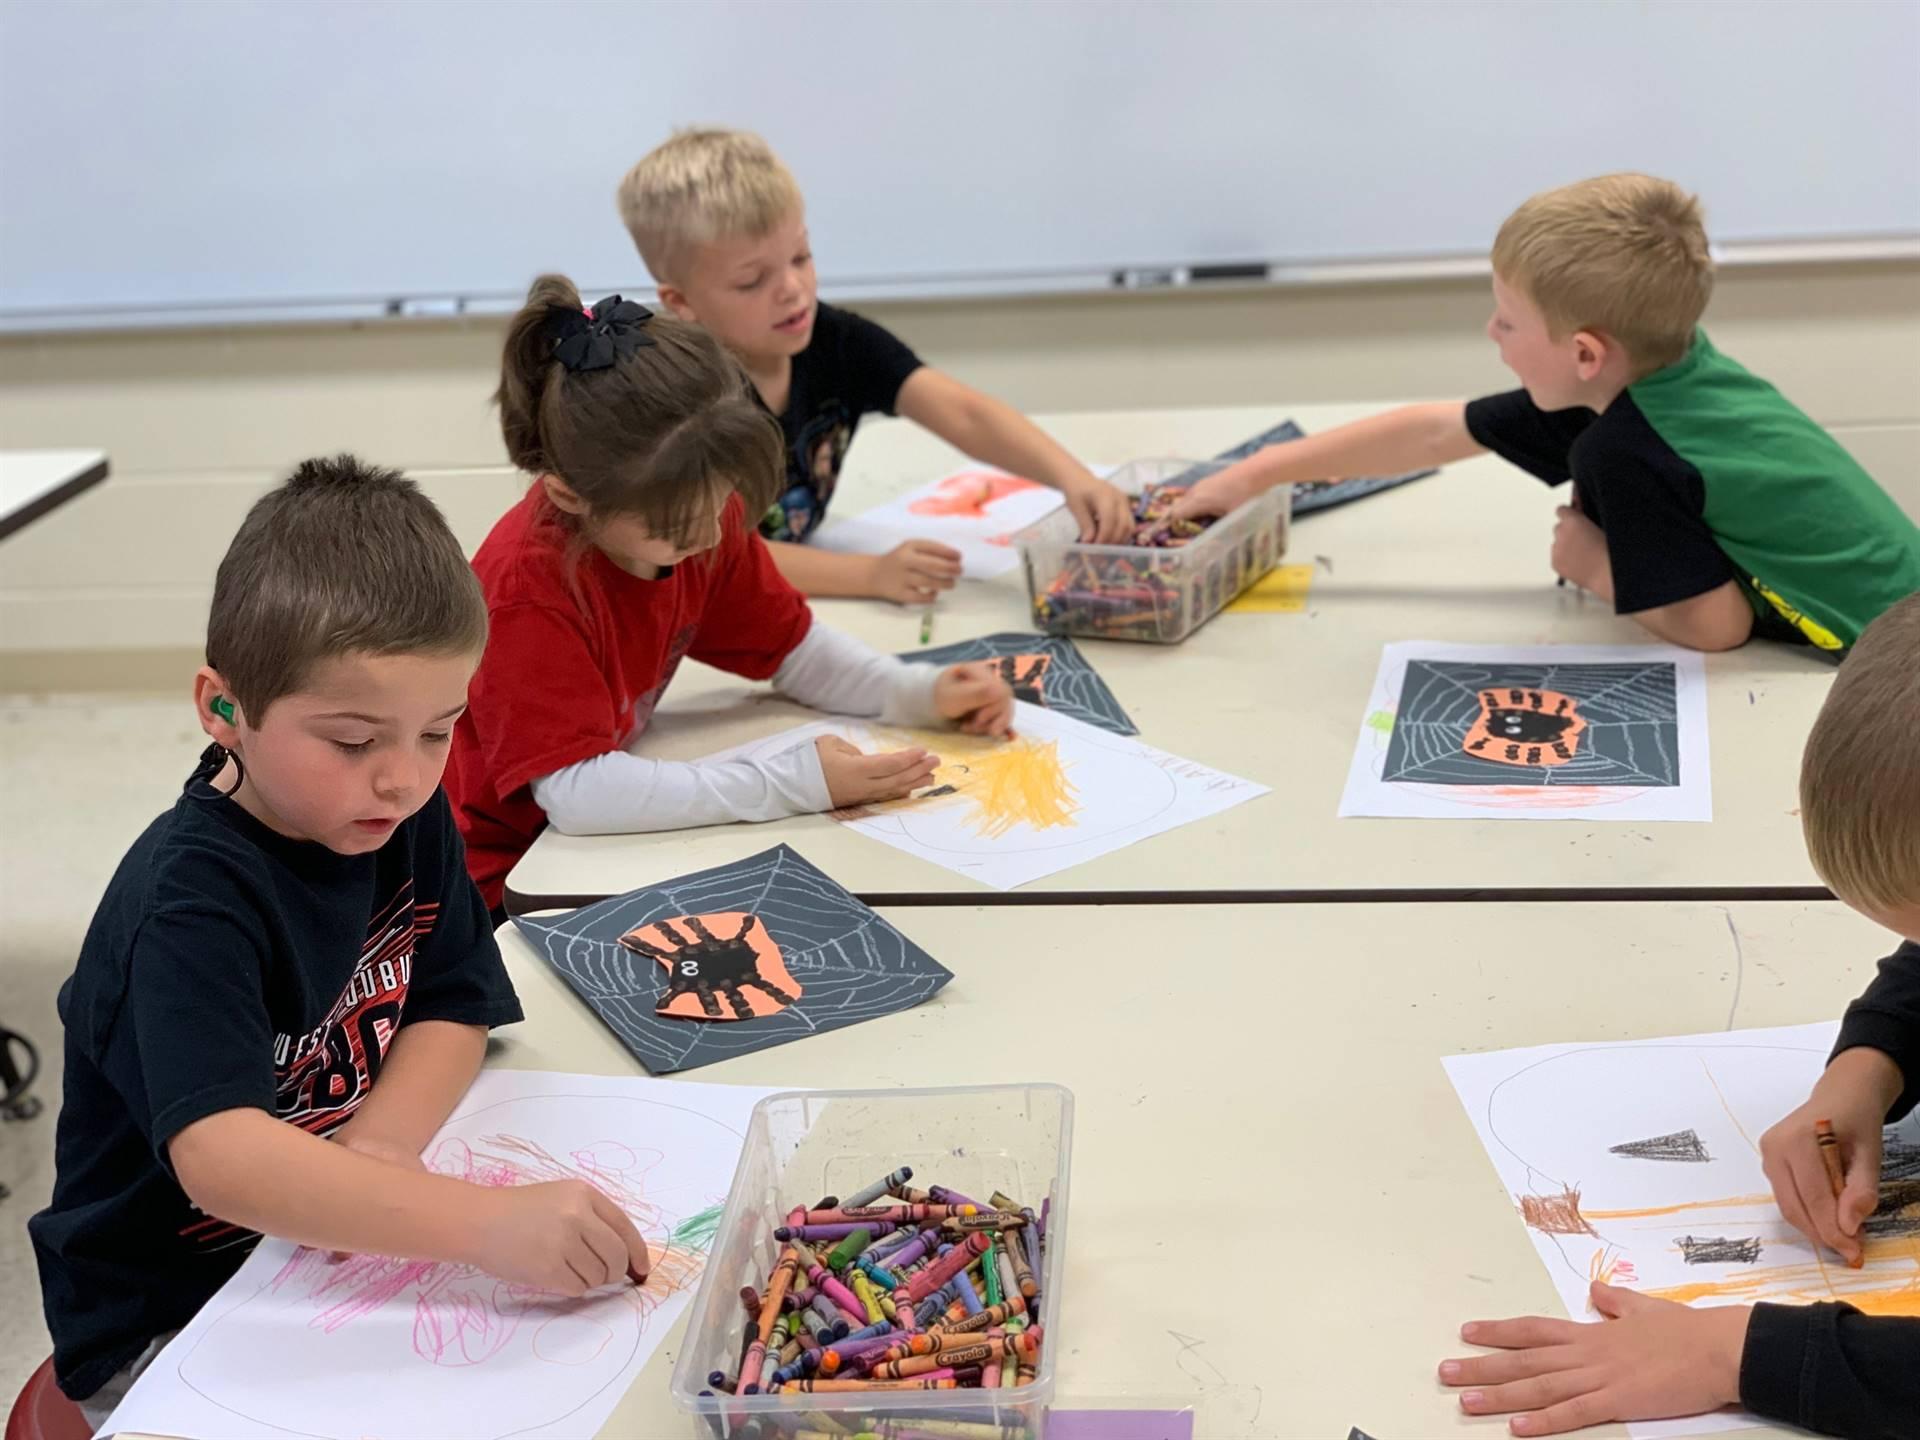 Kindergarten students working on art project